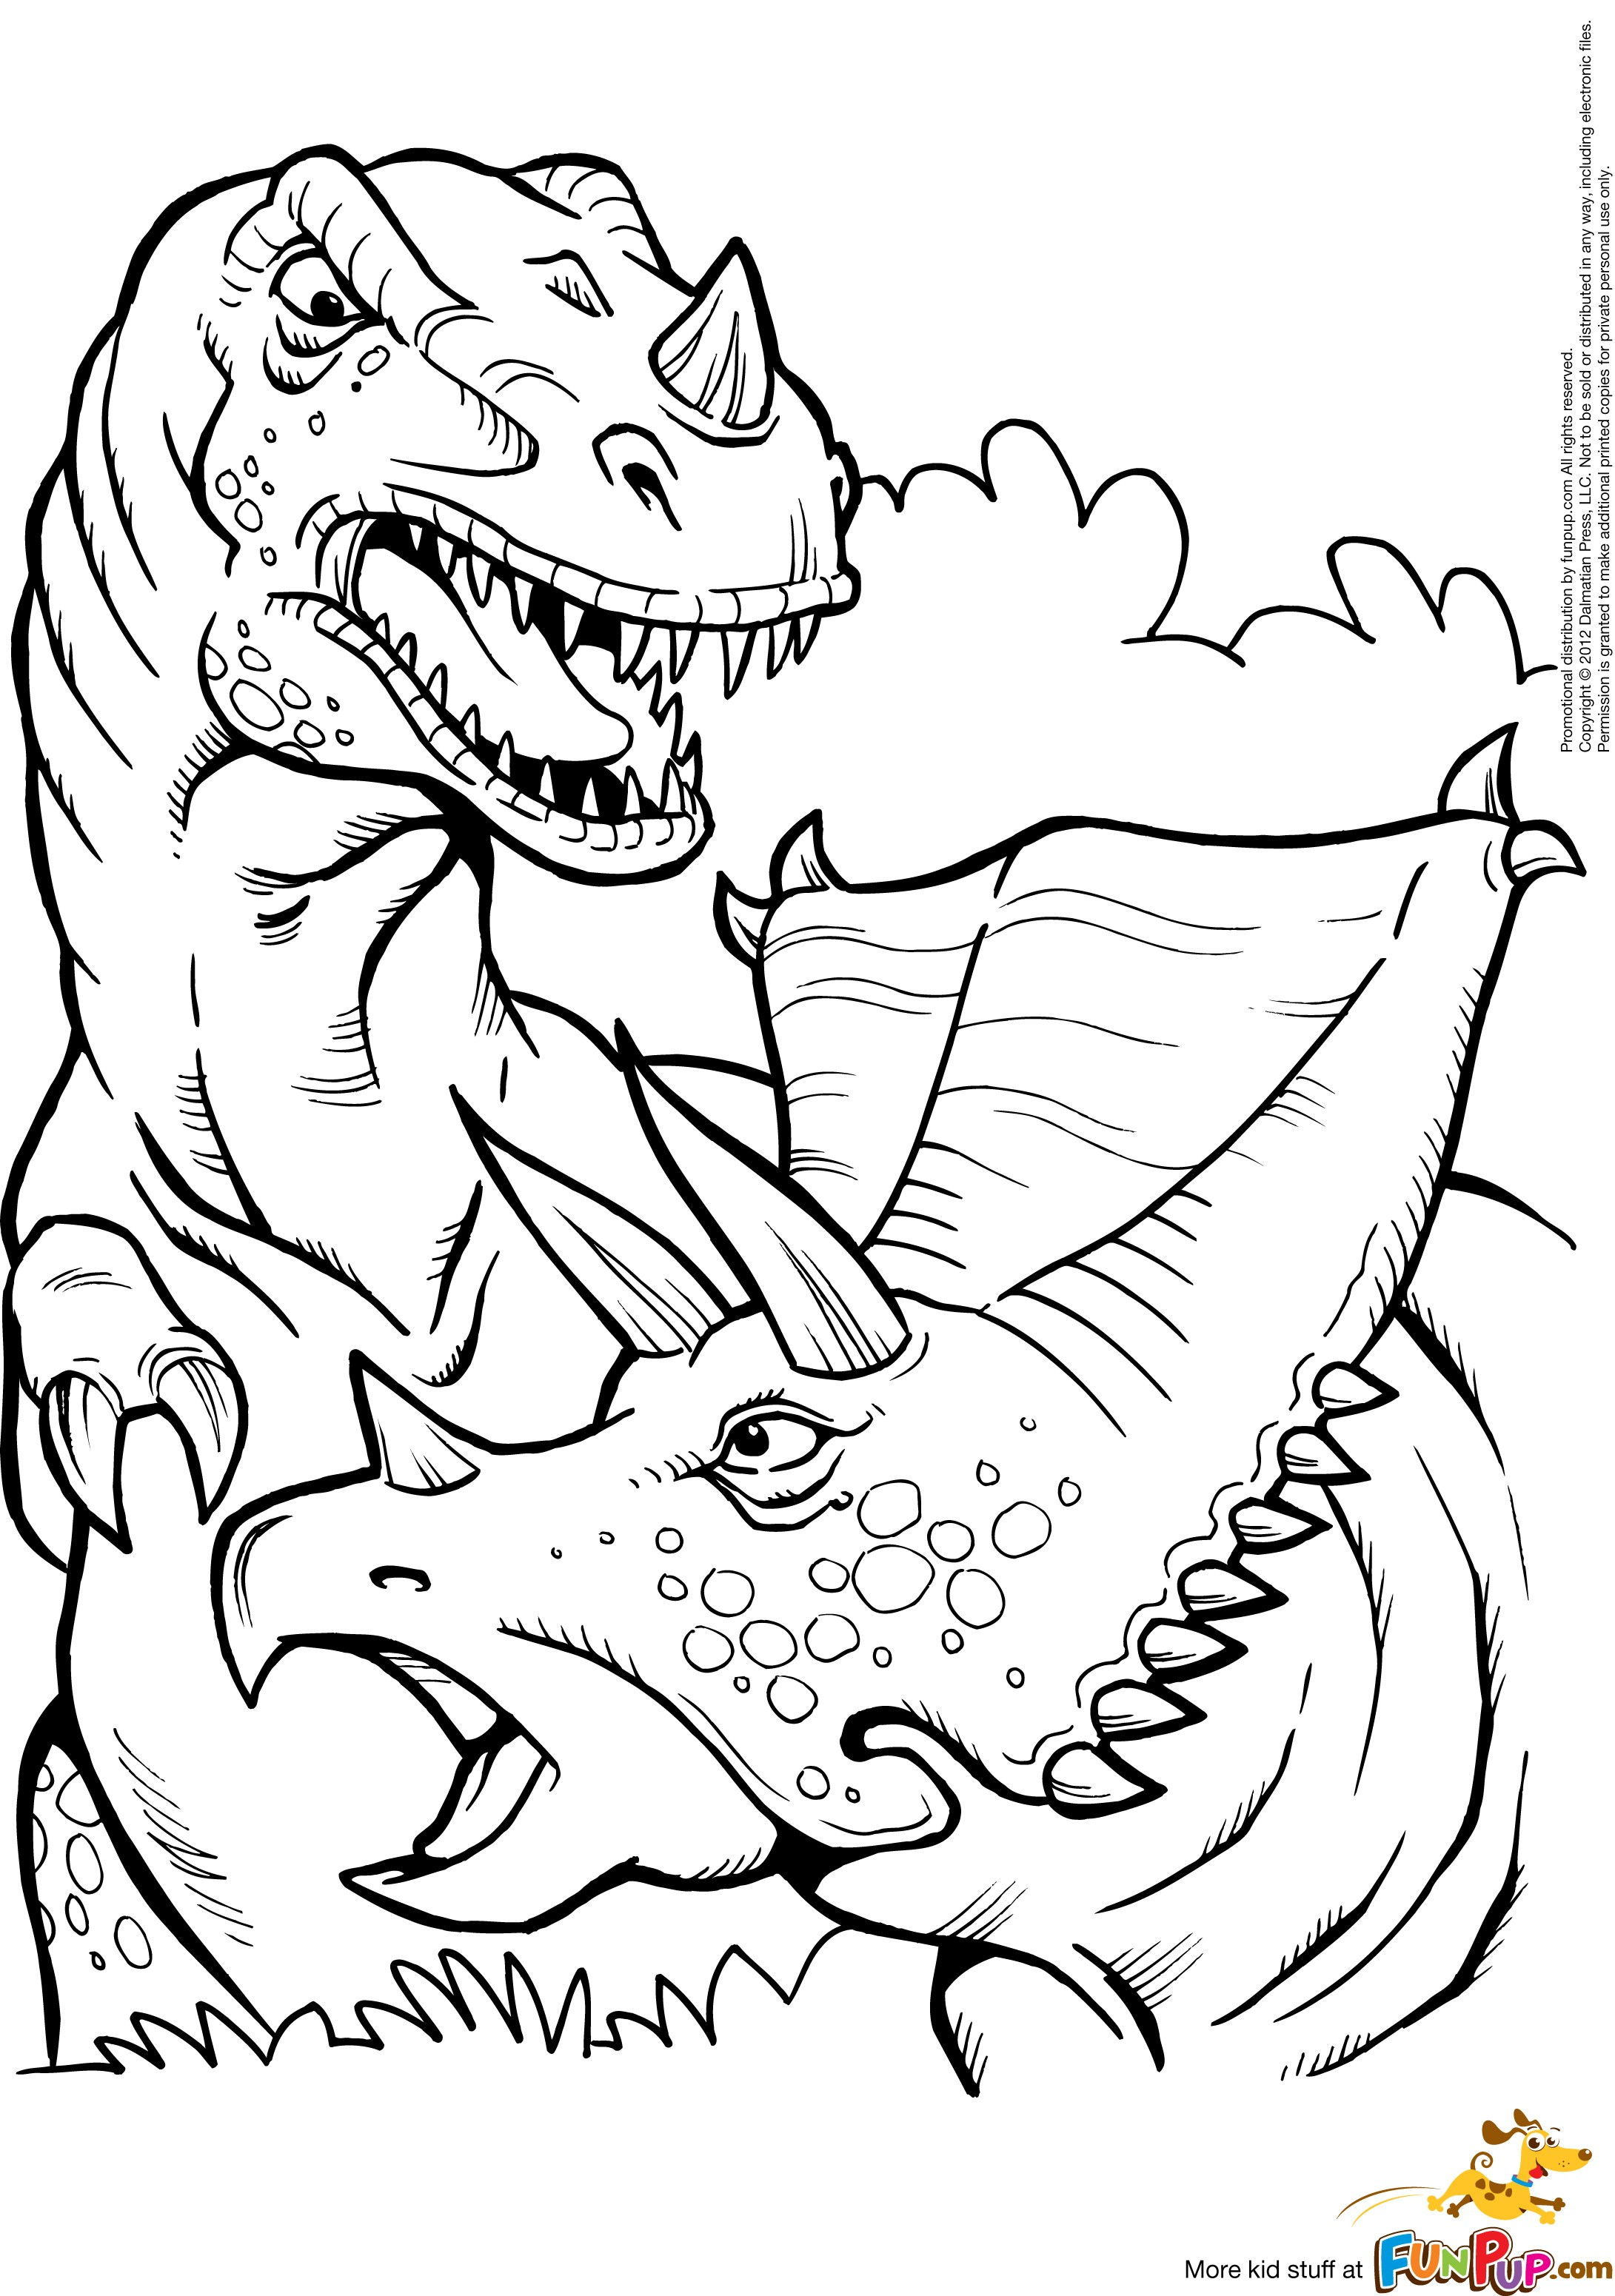 2181x3101 Successful Triceratops Coloring Page Kleurplaat Printable T Rex